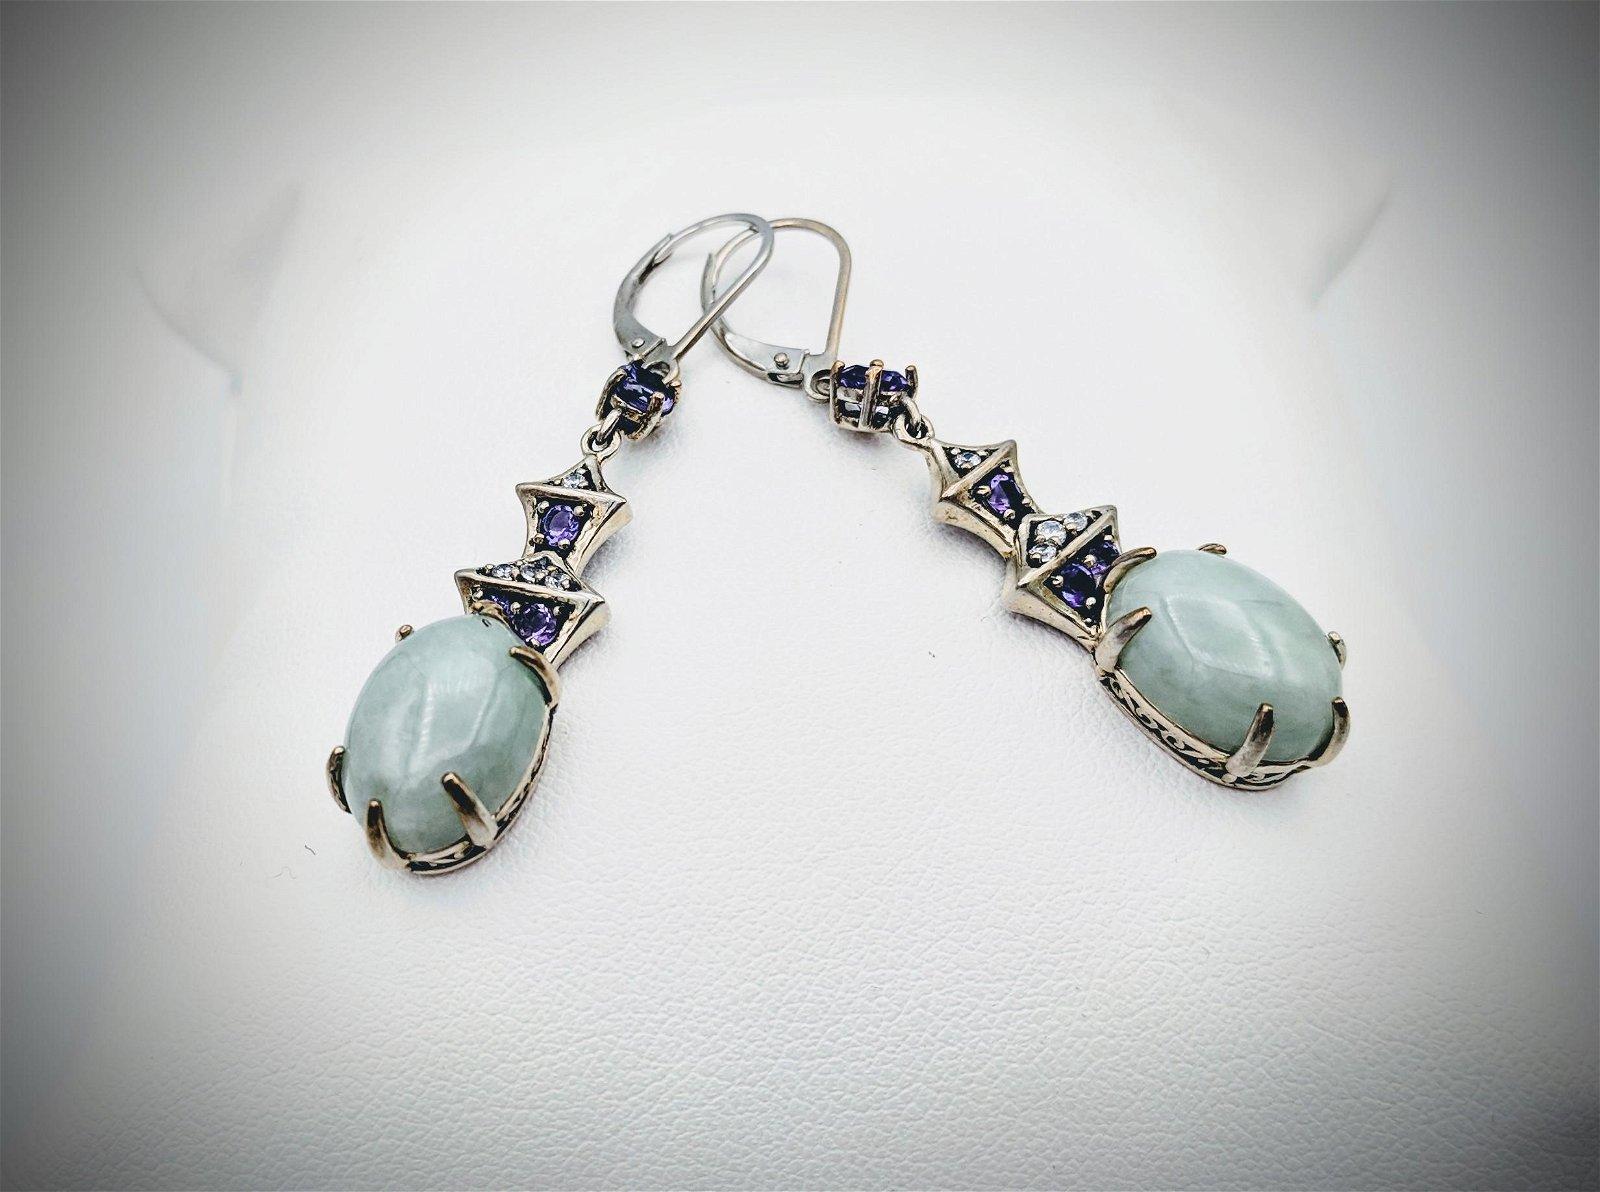 925 SS Dangly Cocktail Earrings w Jade & Amethyst